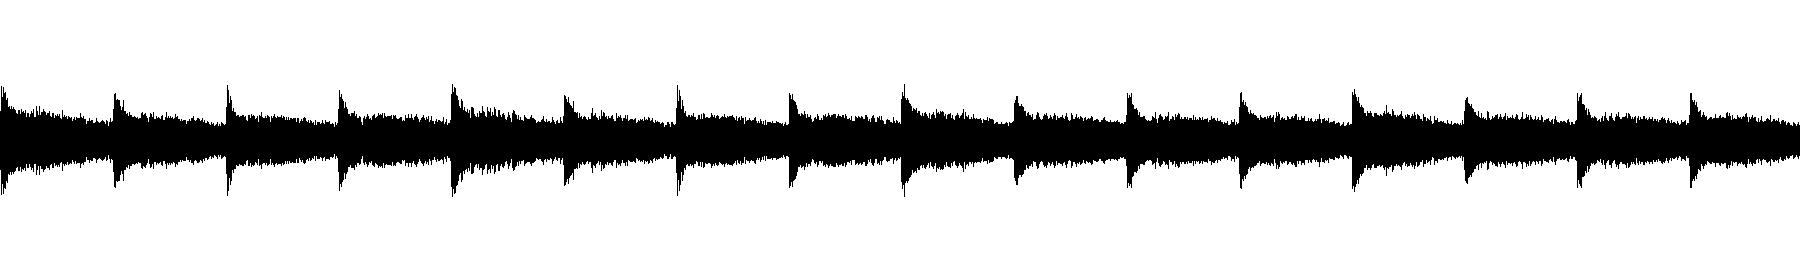 twangy trap melody